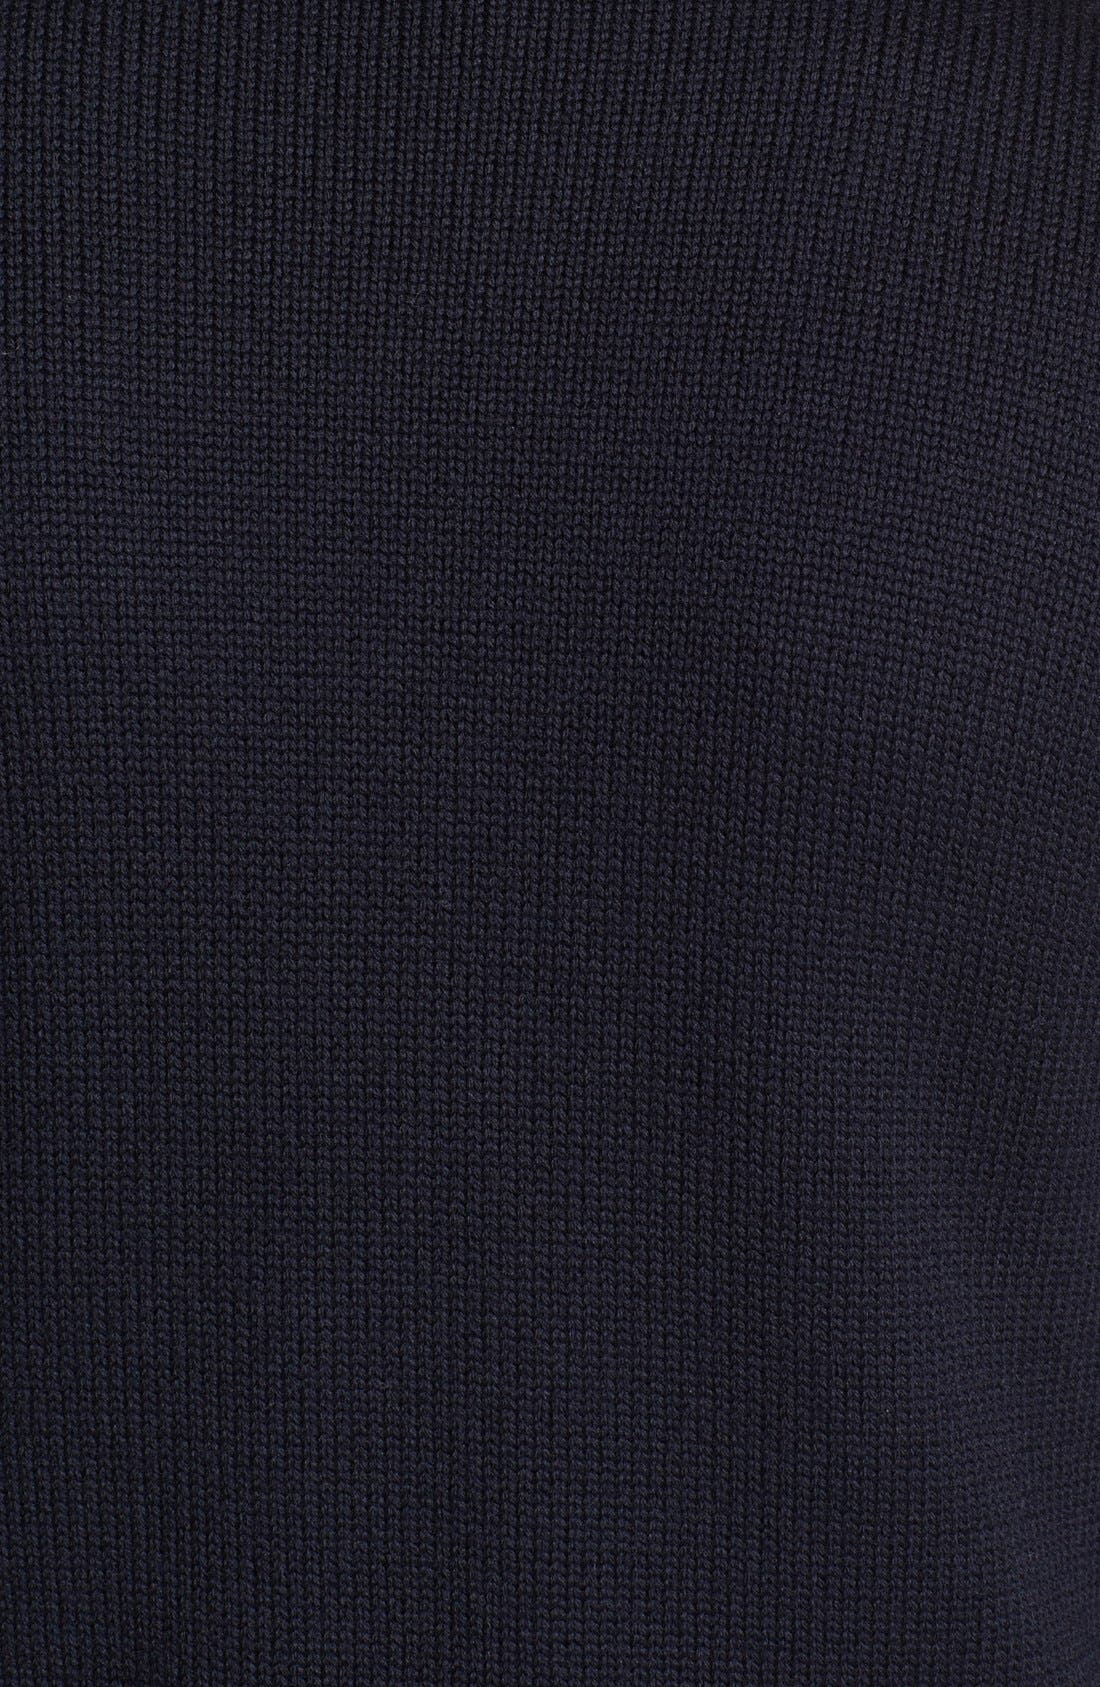 Alternate Image 3  - sandro 'Oscillation' Sweater